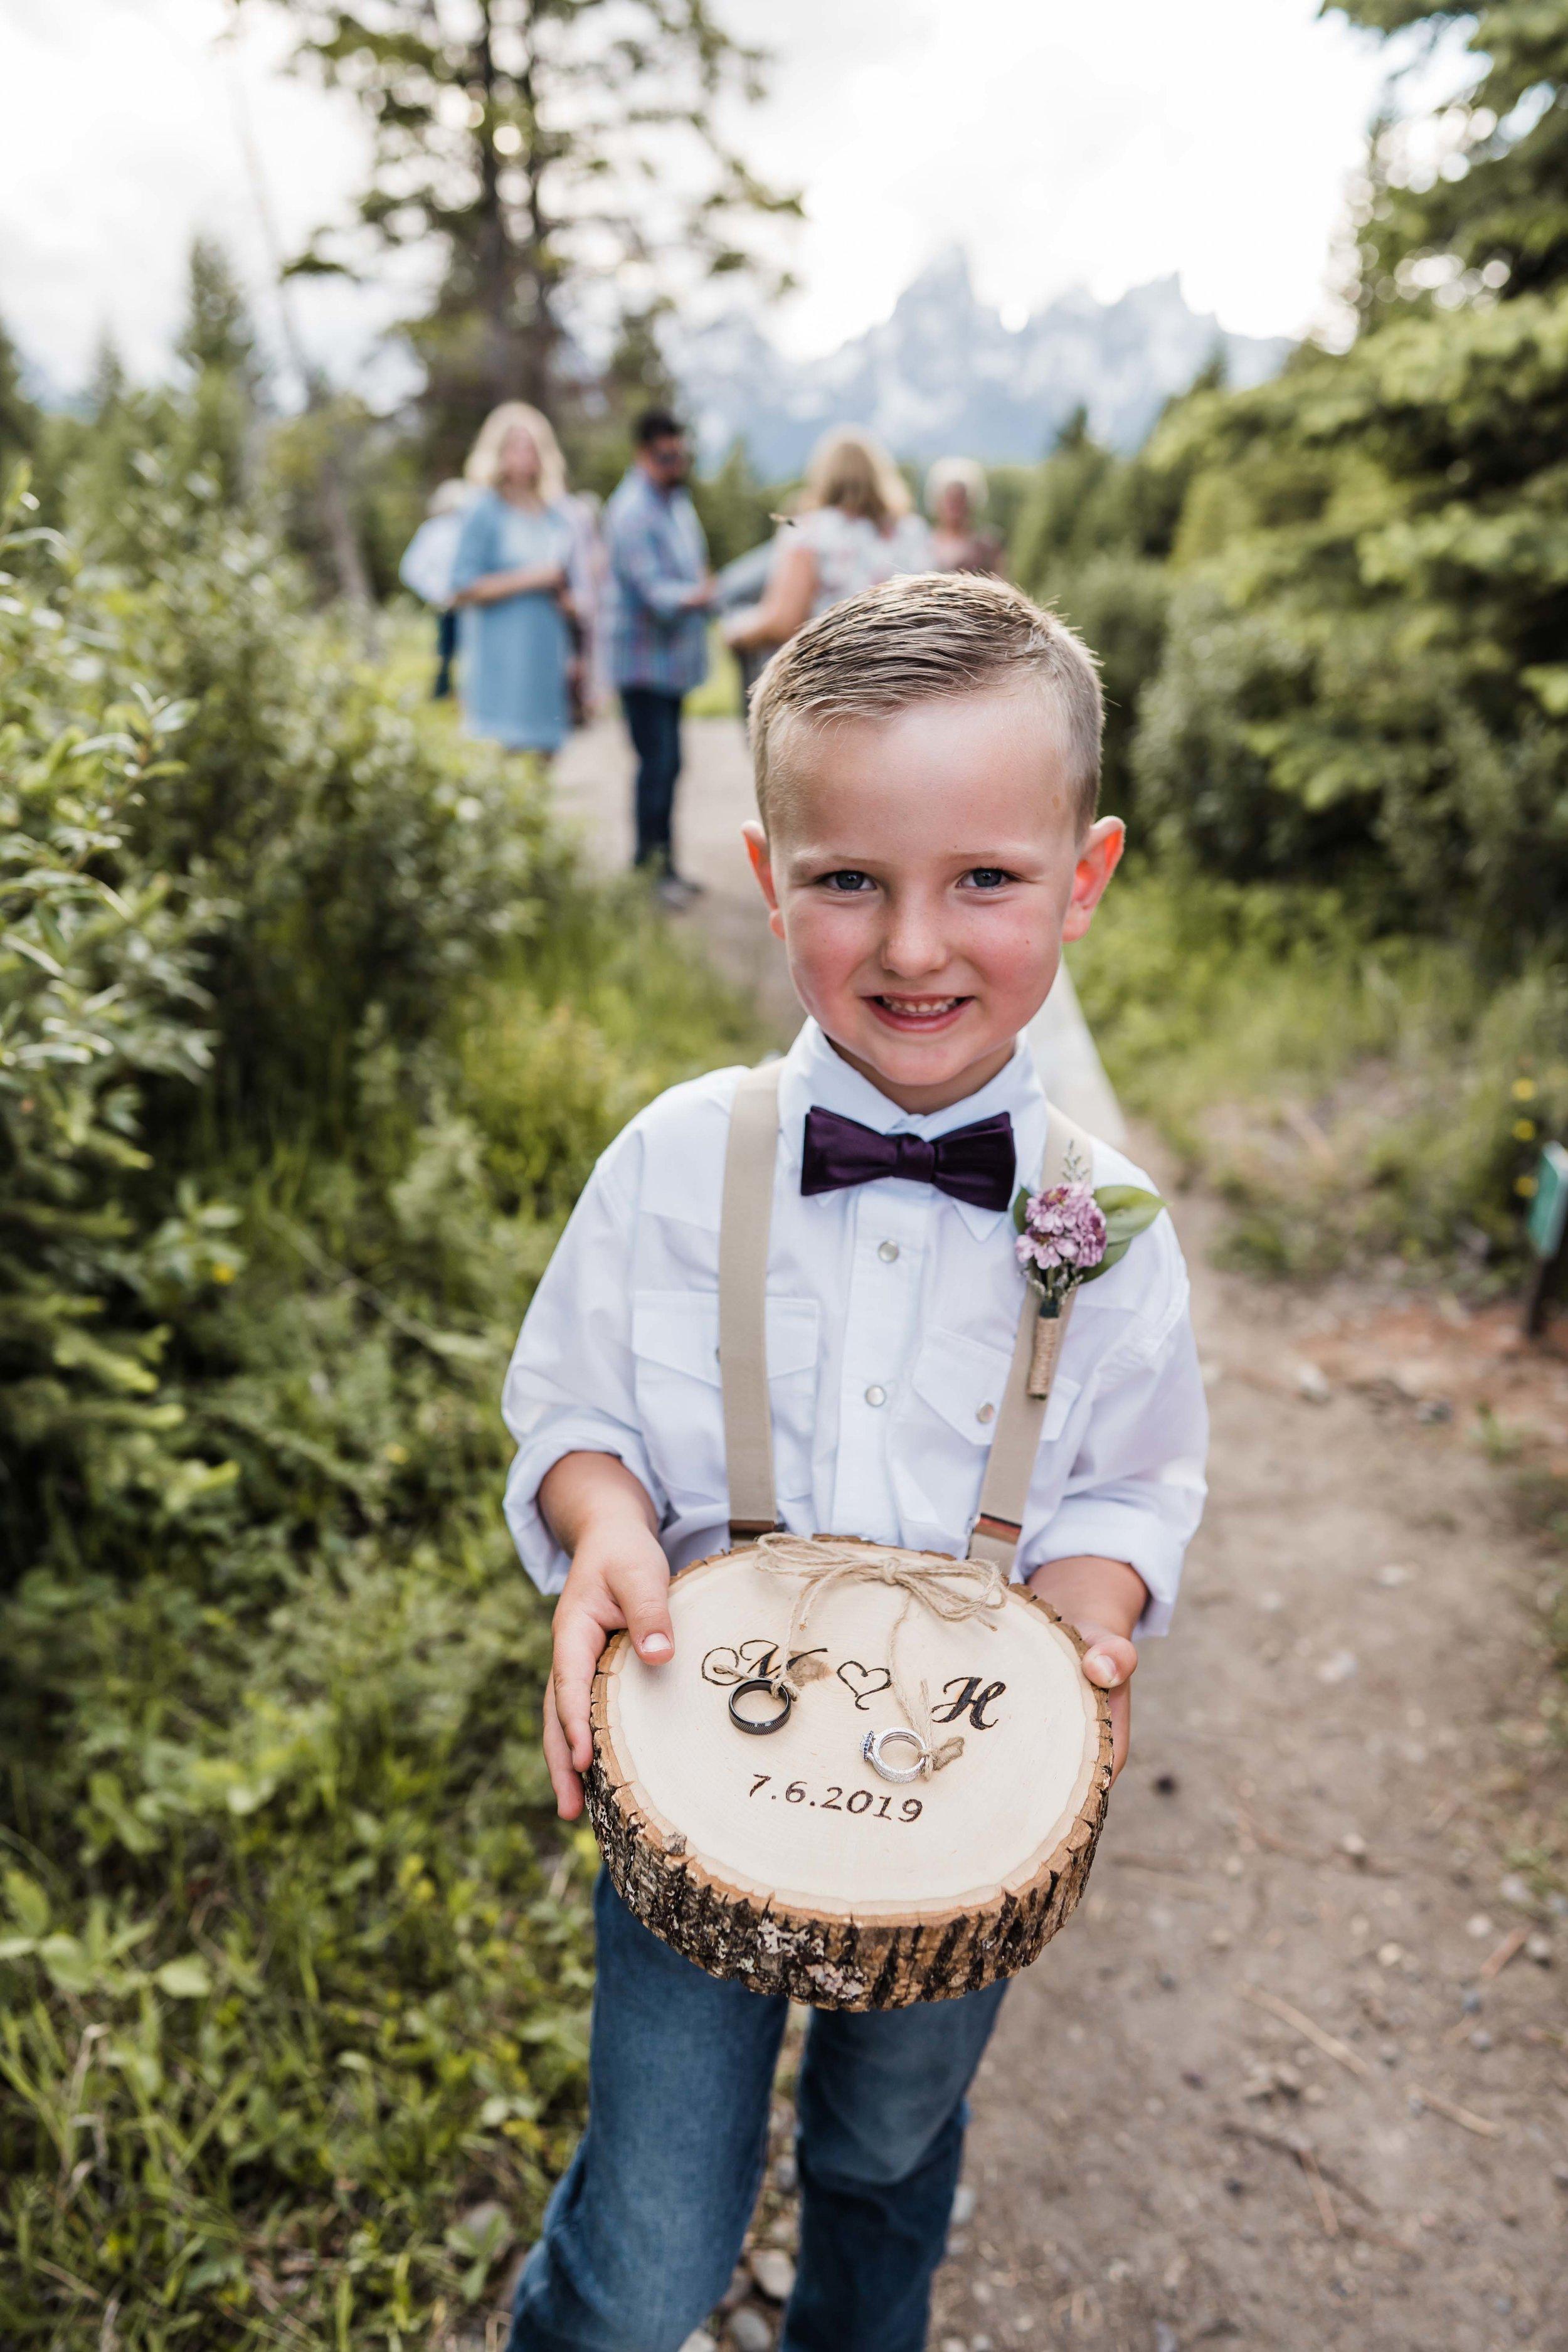 jackson hole adventure wedding photography at schwabachers landing in GTNP -DSD01553.jpg